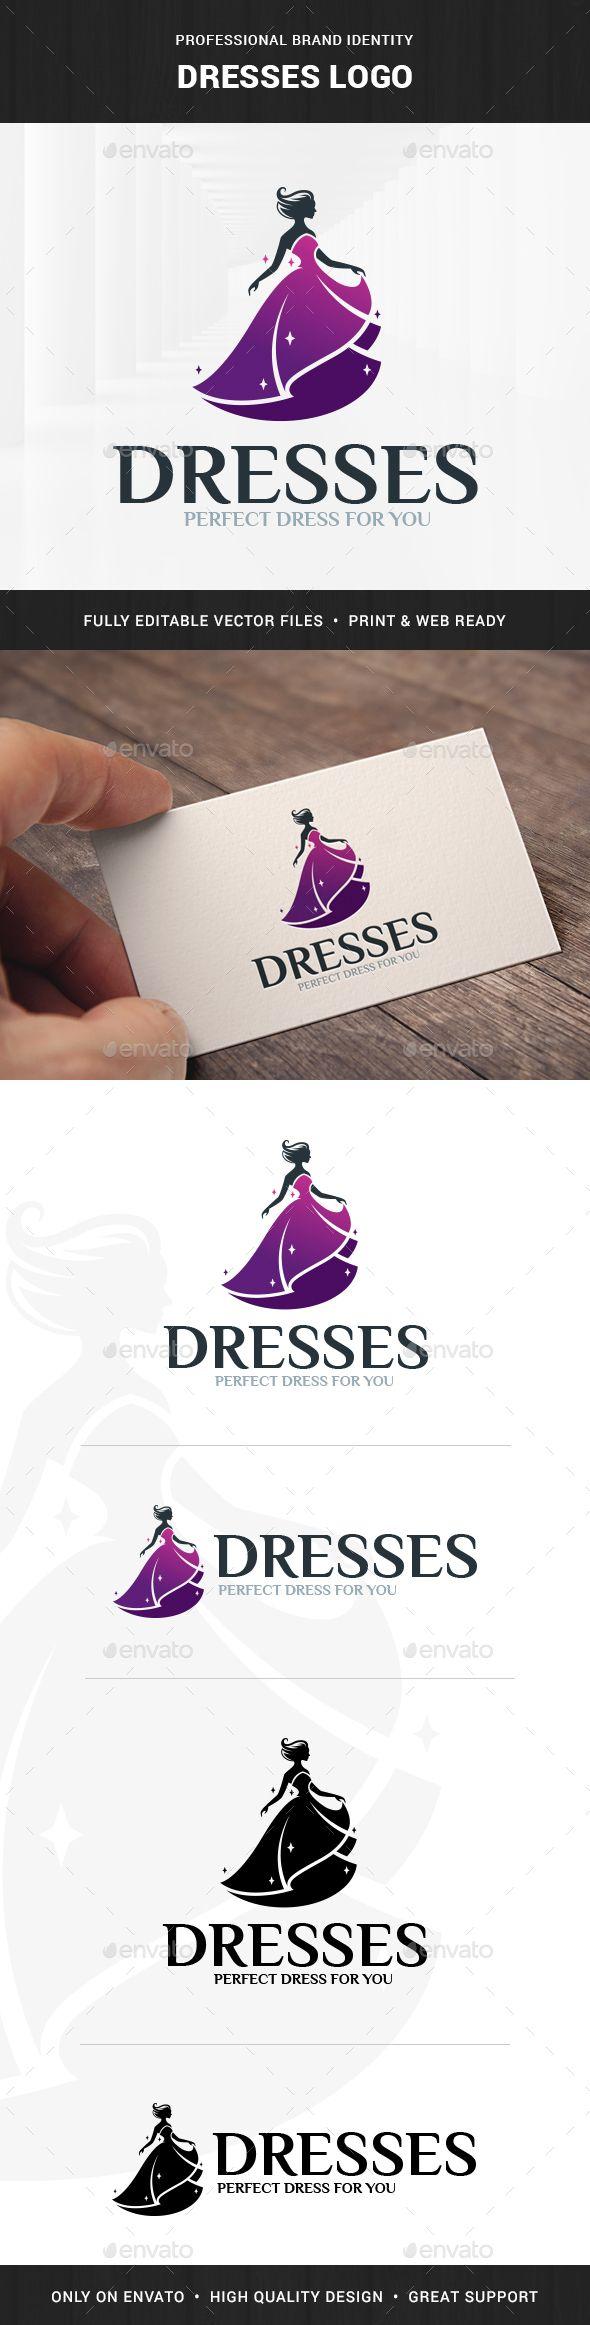 Dresses Logo Template Vector EPS, AI Illustrator